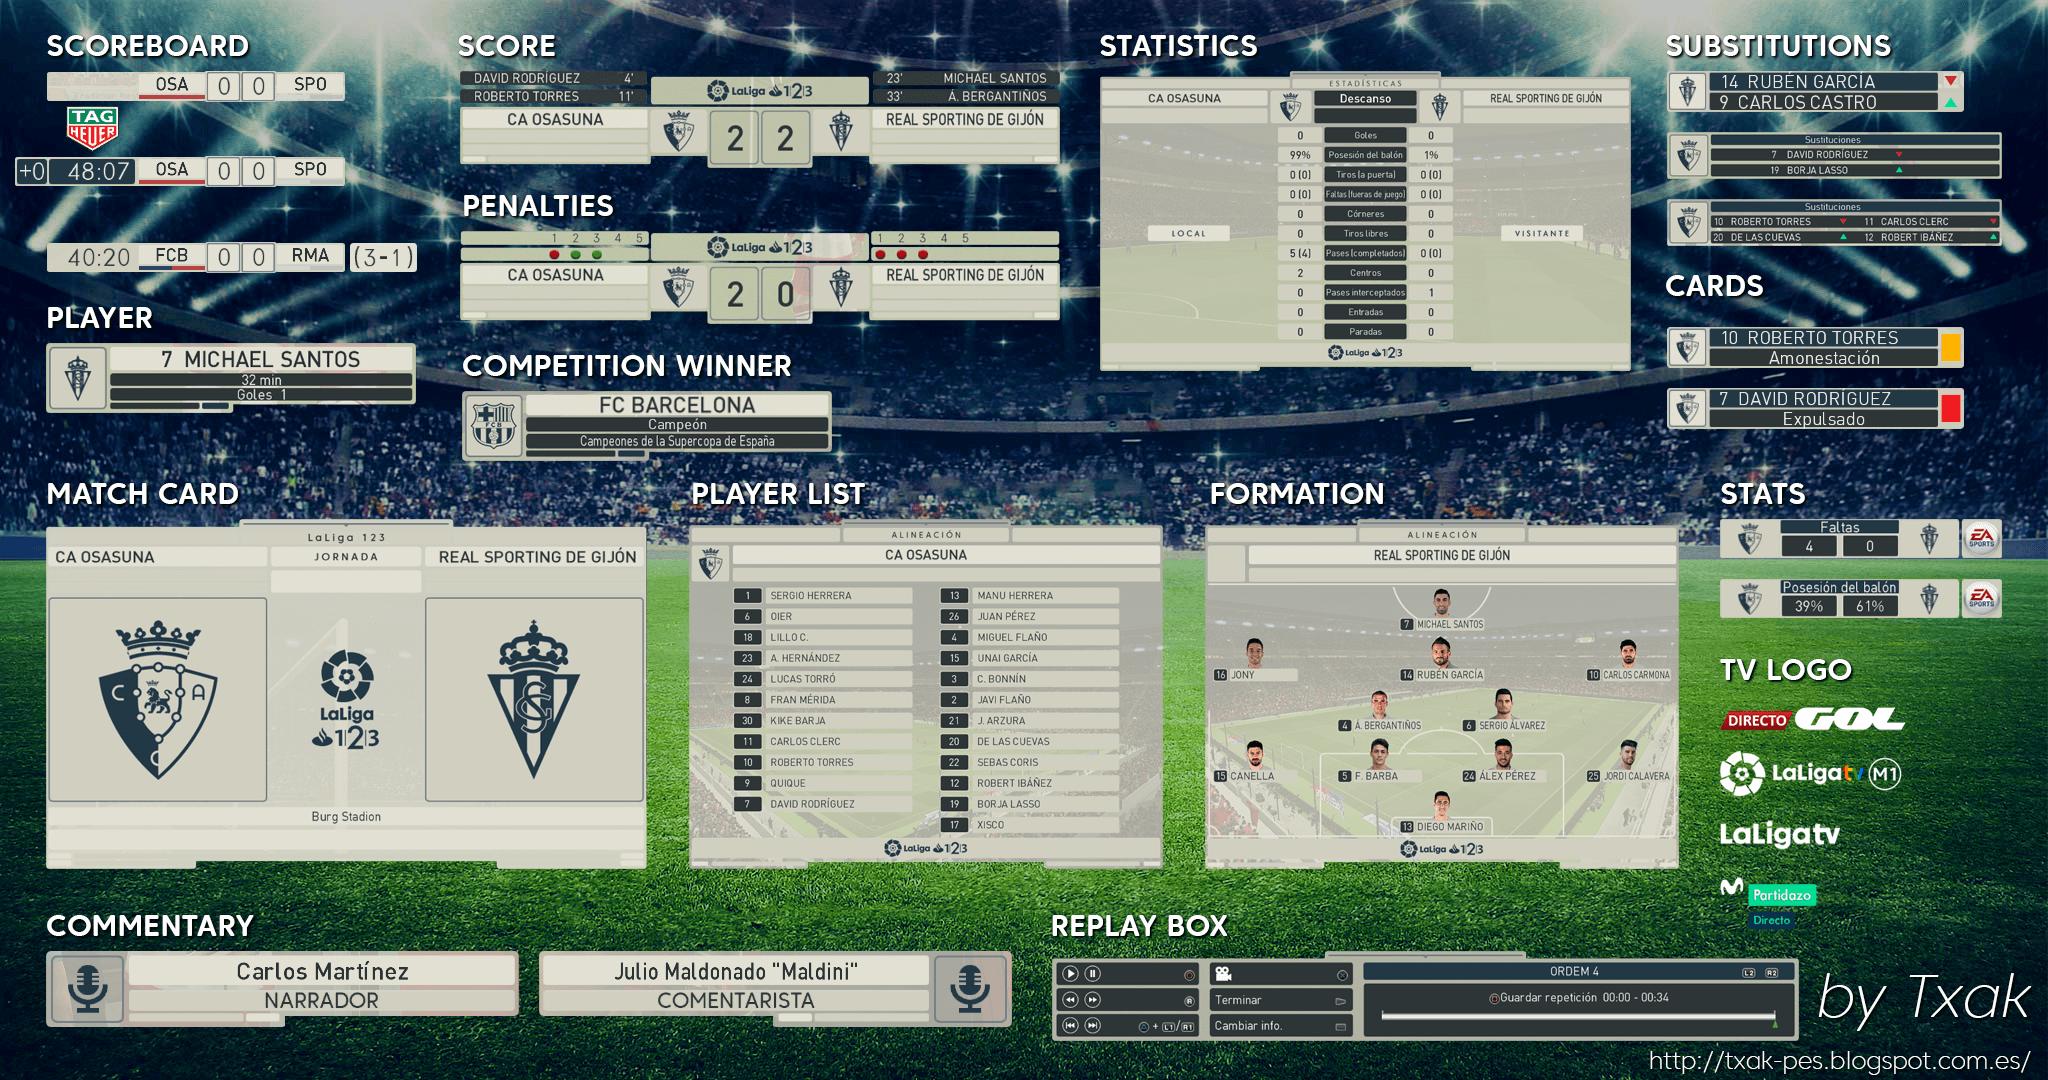 LaLiga 123 Scoreboard v1 by Txak